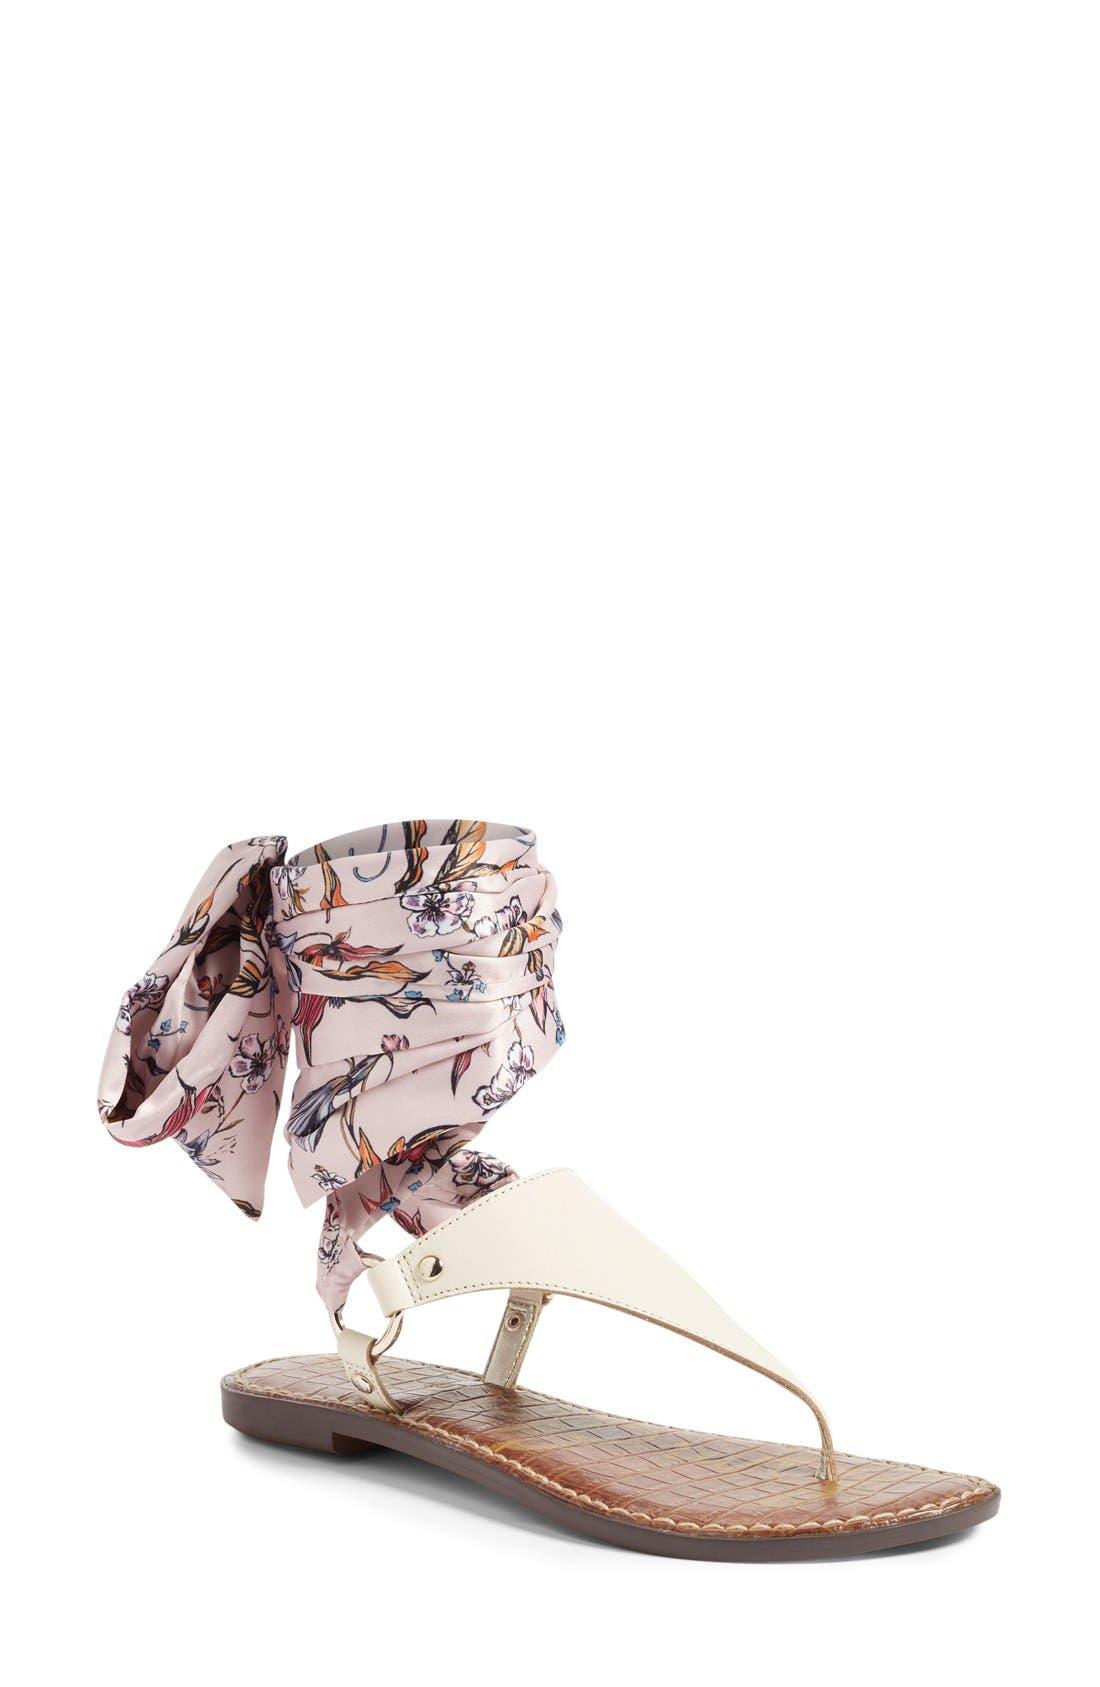 Alternate Image 1 Selected - Sam Edelman Giliana Ankle Tie Thong Sandal (Women)